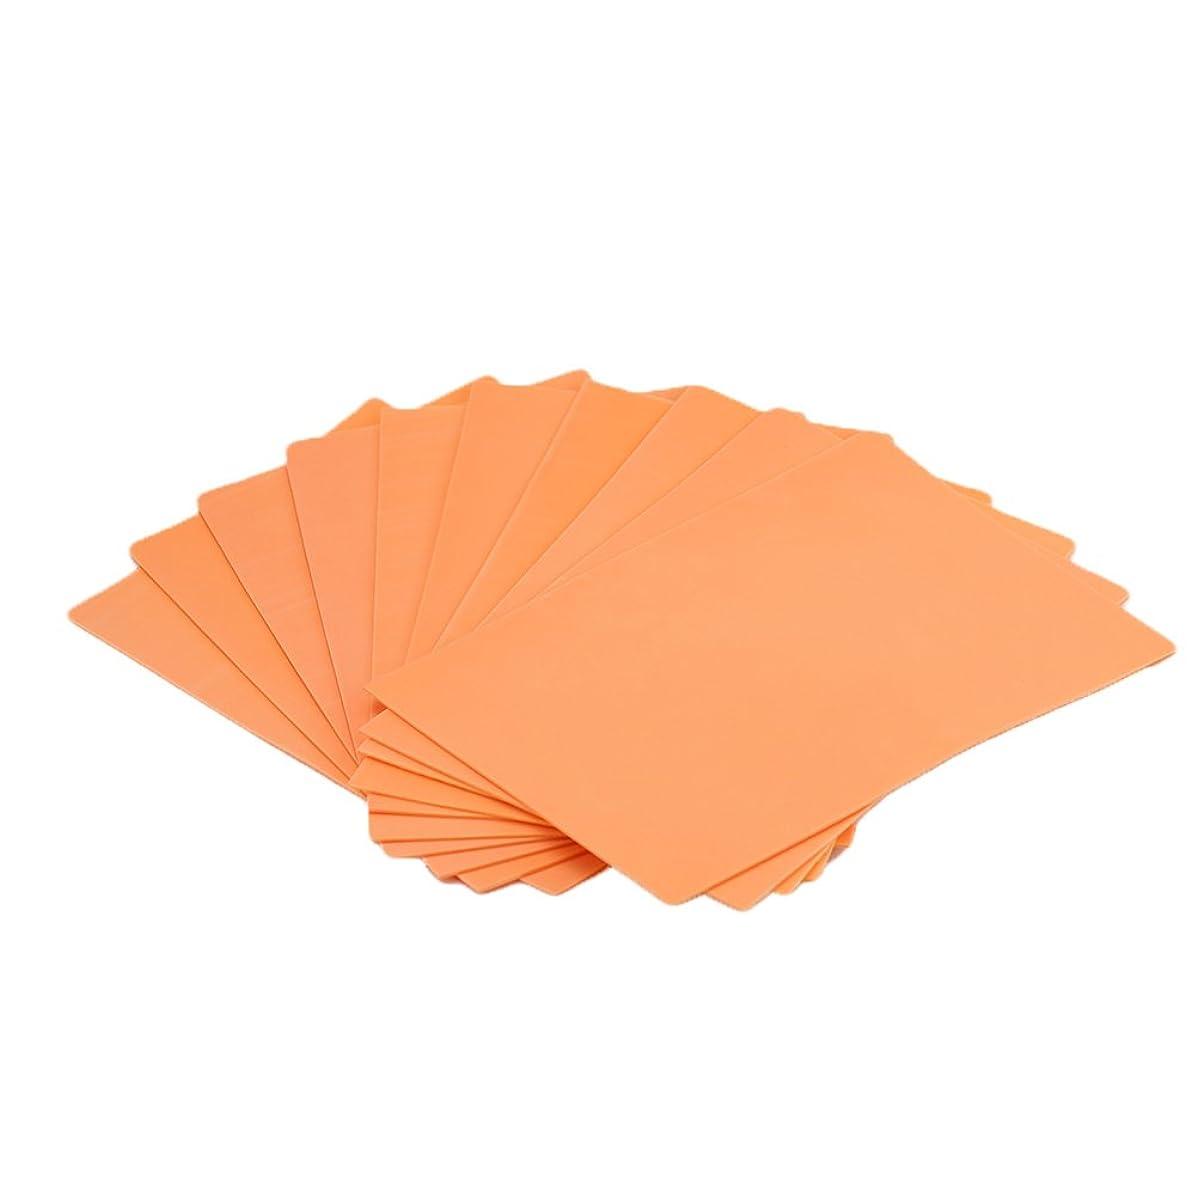 EVA Foam Paper Sheet (20 pcs)-8x12 Inch-2mm Thick A4 Size for Children's Craft Activities DIY Cutters Art-21x30cm (Orange)